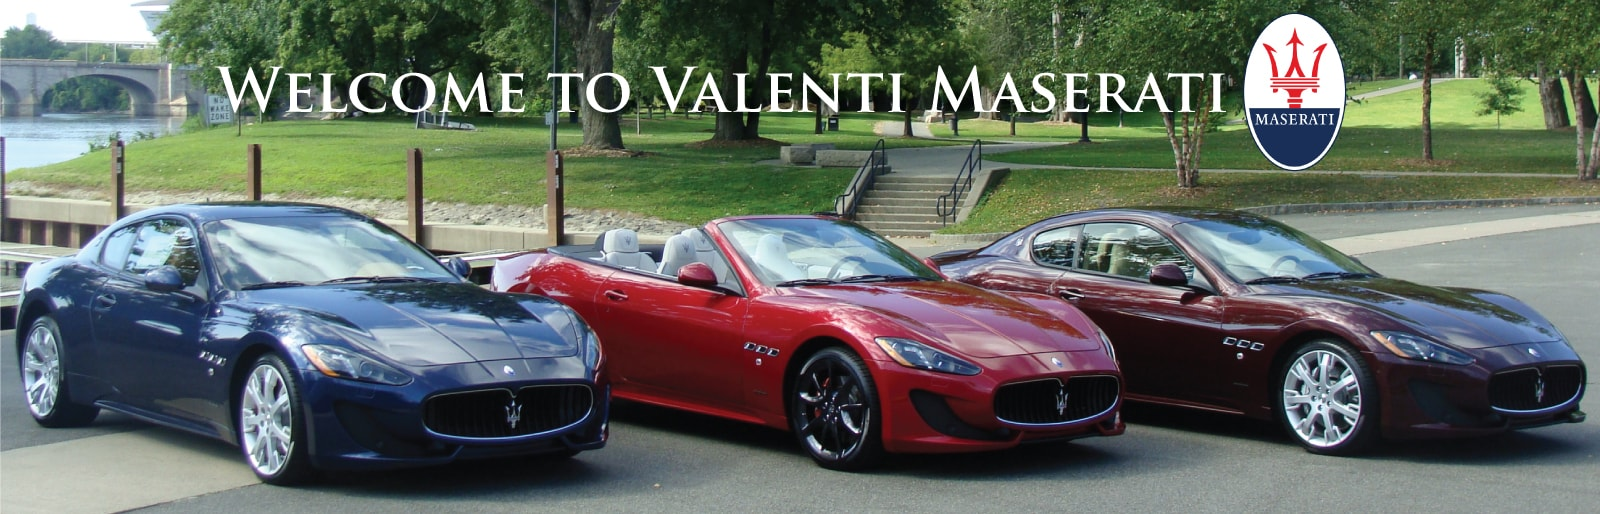 Valenti maserati new maserati dealership in hartford ct for Valenti motors watertown connecticut